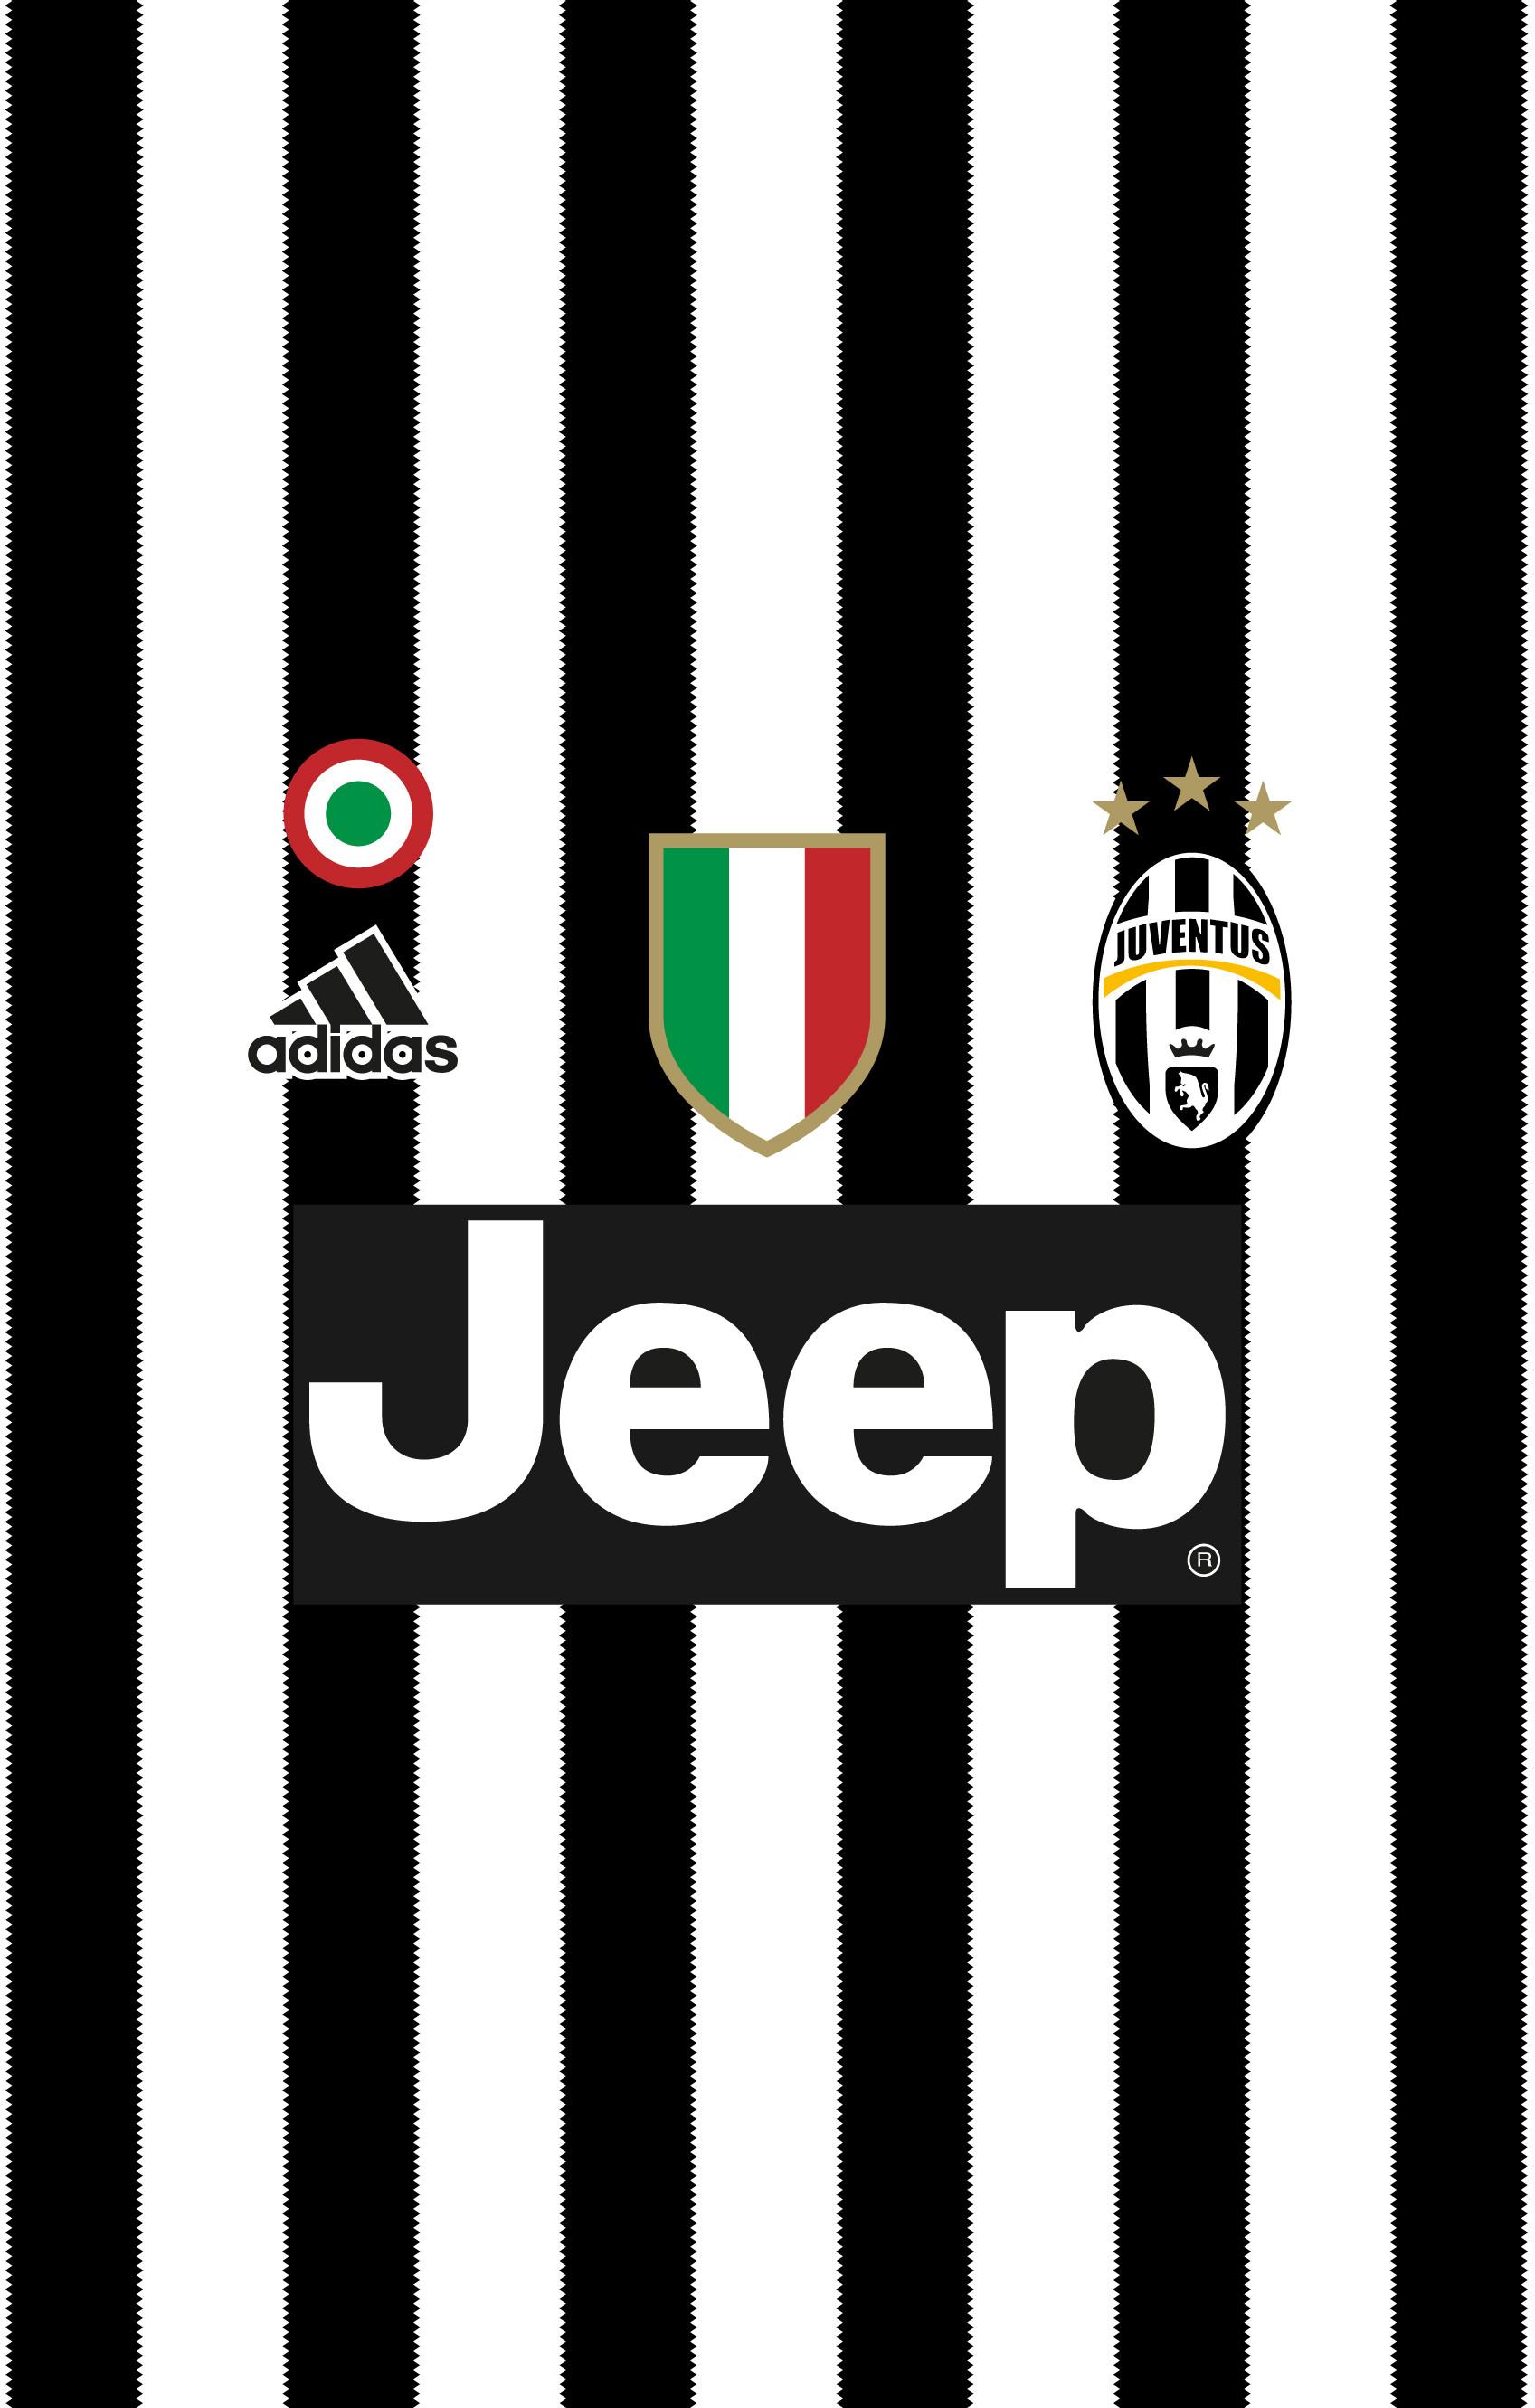 Juventus sfondi 81 immagini for Sfondi animati juventus